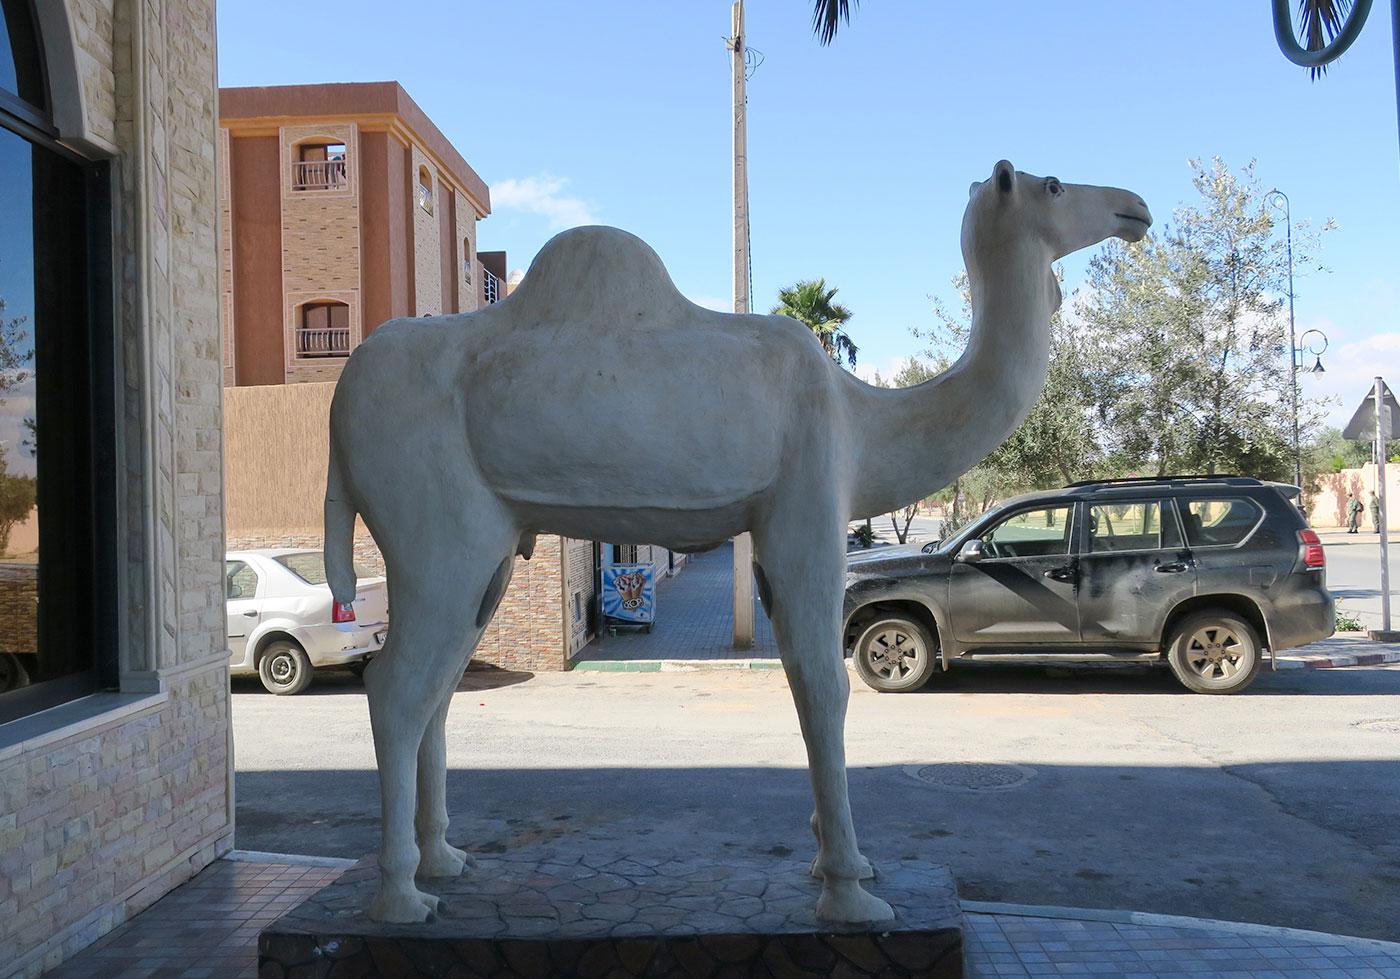 10_guelmim_marokko_2018-11-26_4467